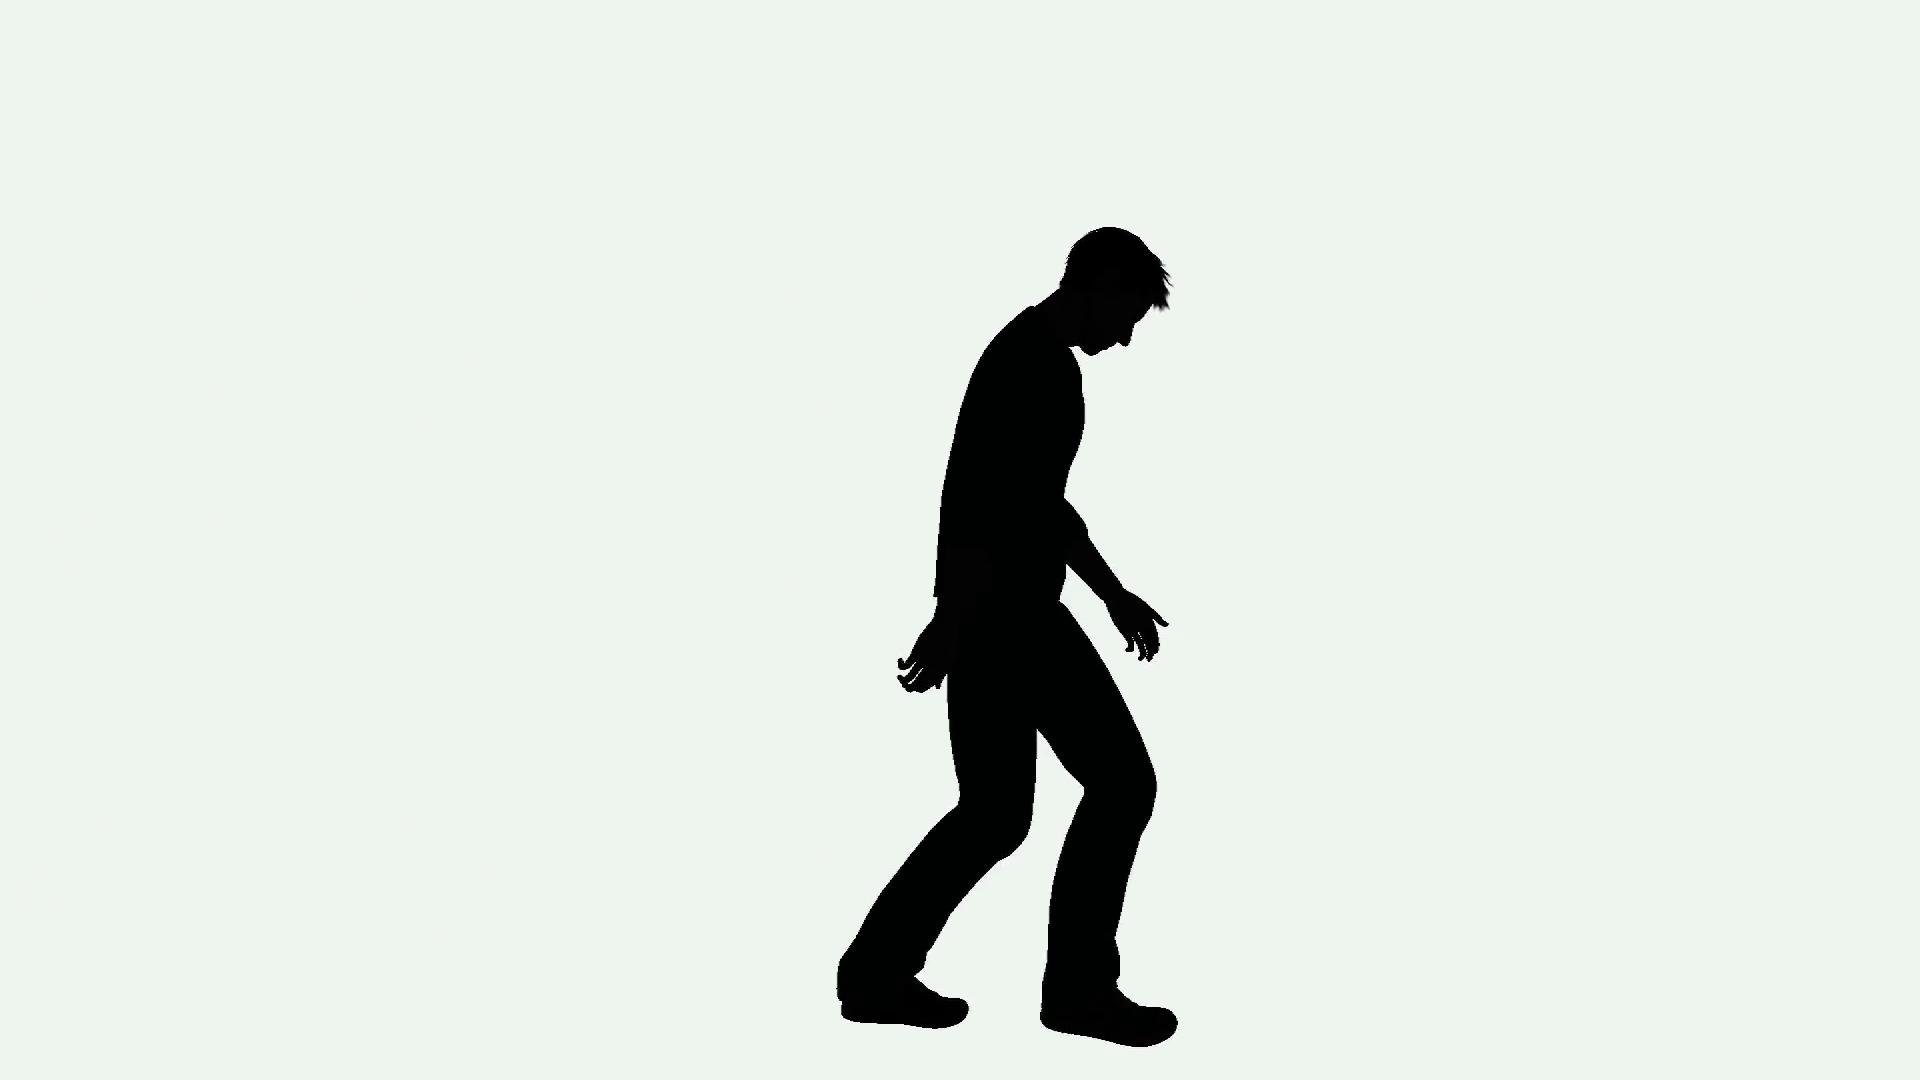 1920x1080 Depressed Man Walking Silhouette Motion Background